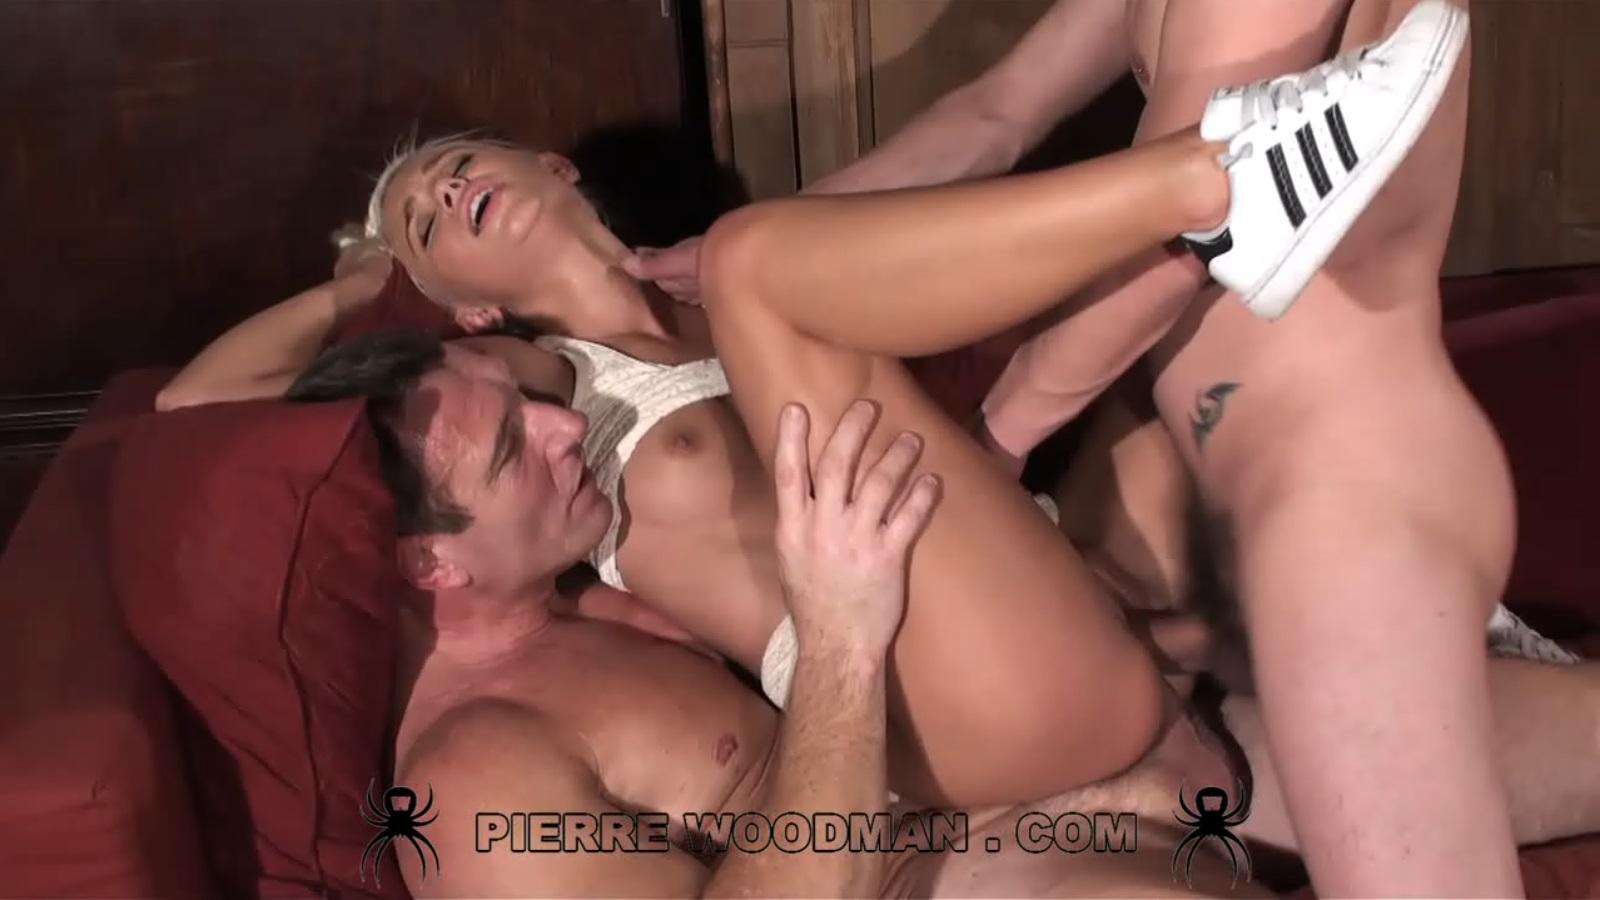 смотреть онлайн порно ролики извращенцев